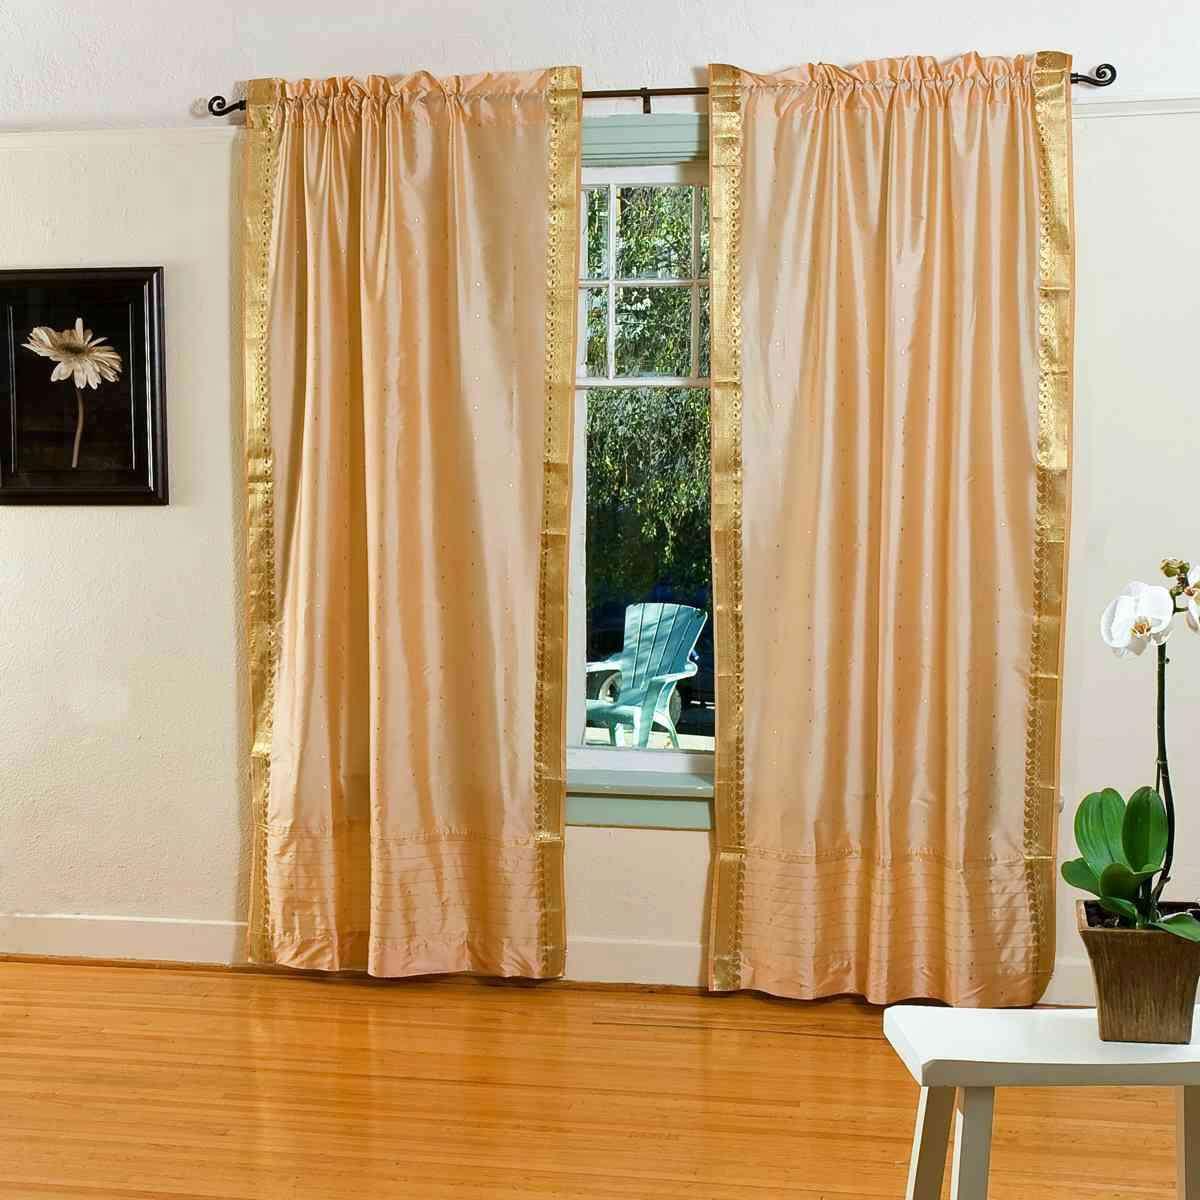 Gold Rod Pocket Sheer Sari Curtain Drape Panel Pair Walmartcom